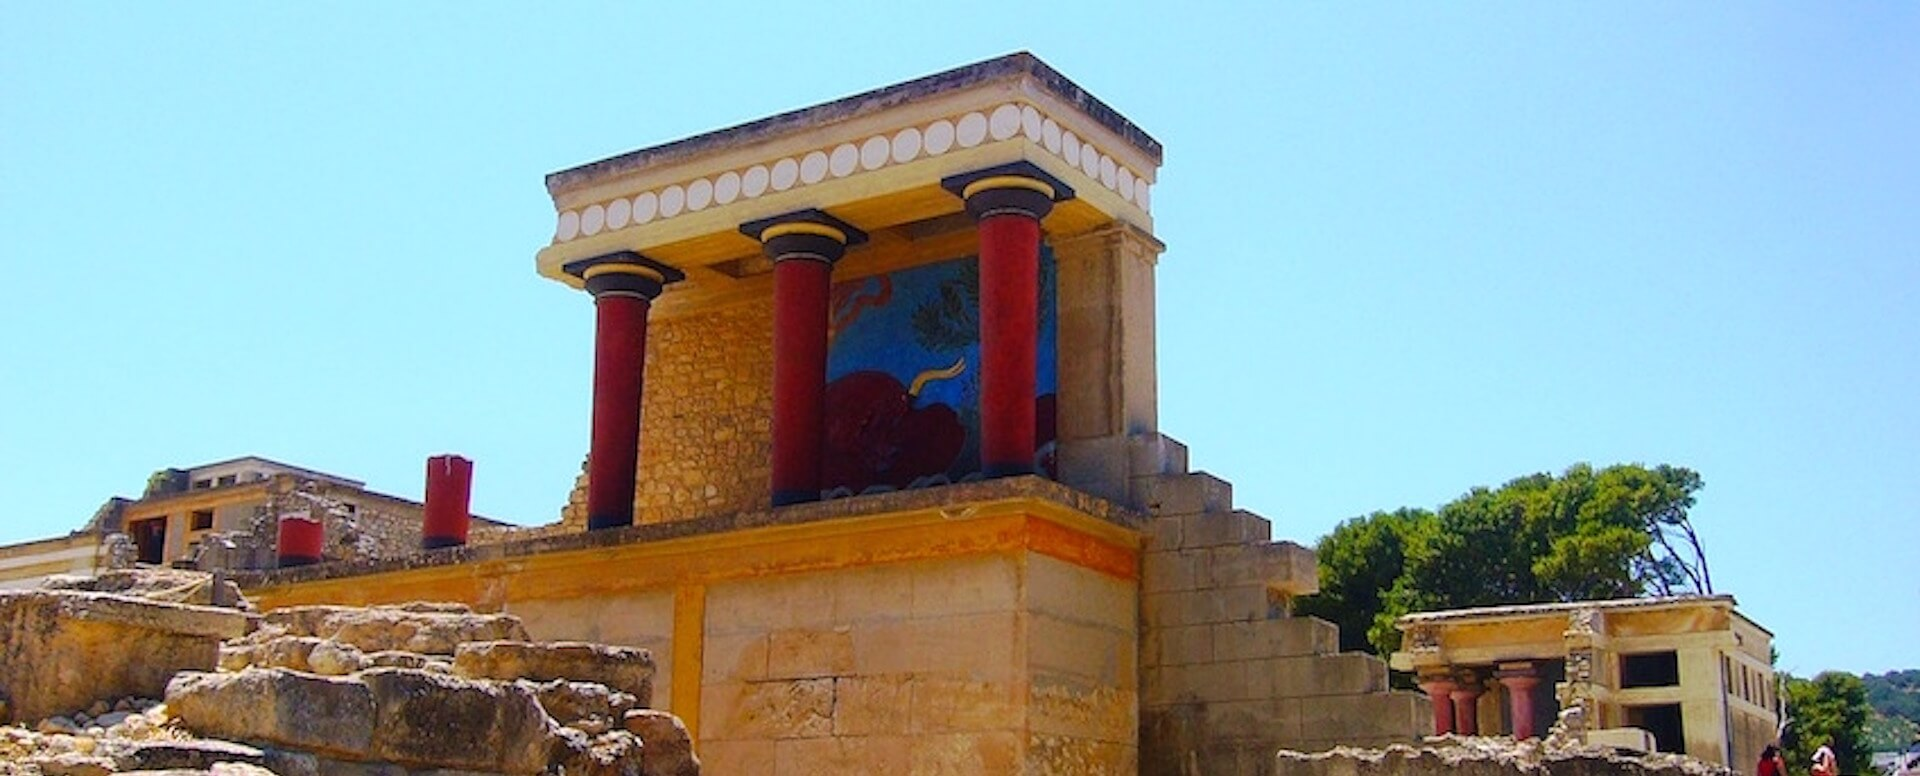 3- Visitez le Palais de Cnossos - Crete